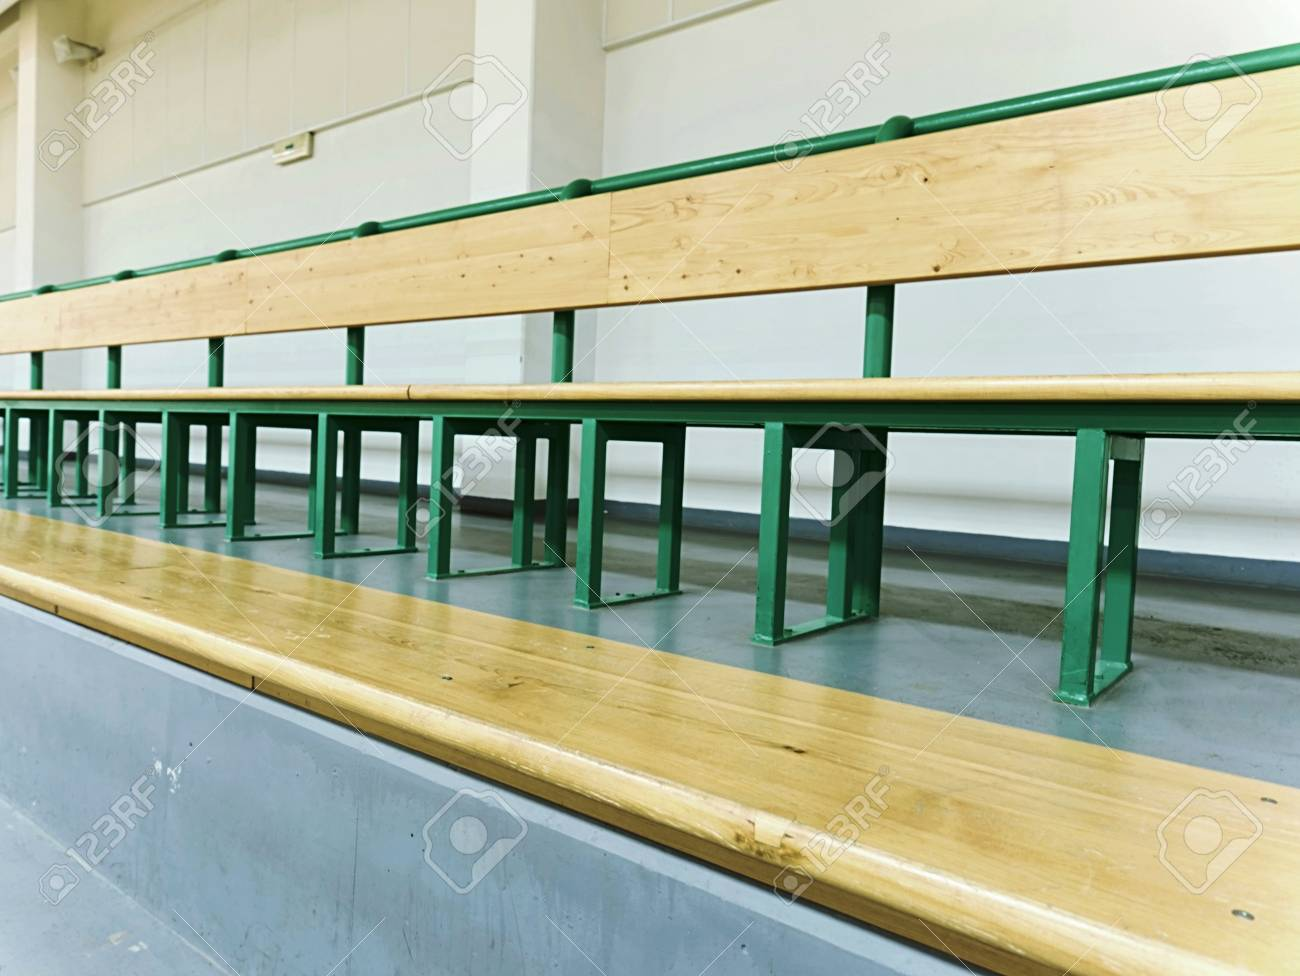 Astounding Empty Wooden Seats In A Sports Stadium Tribune For Fans Of Machost Co Dining Chair Design Ideas Machostcouk